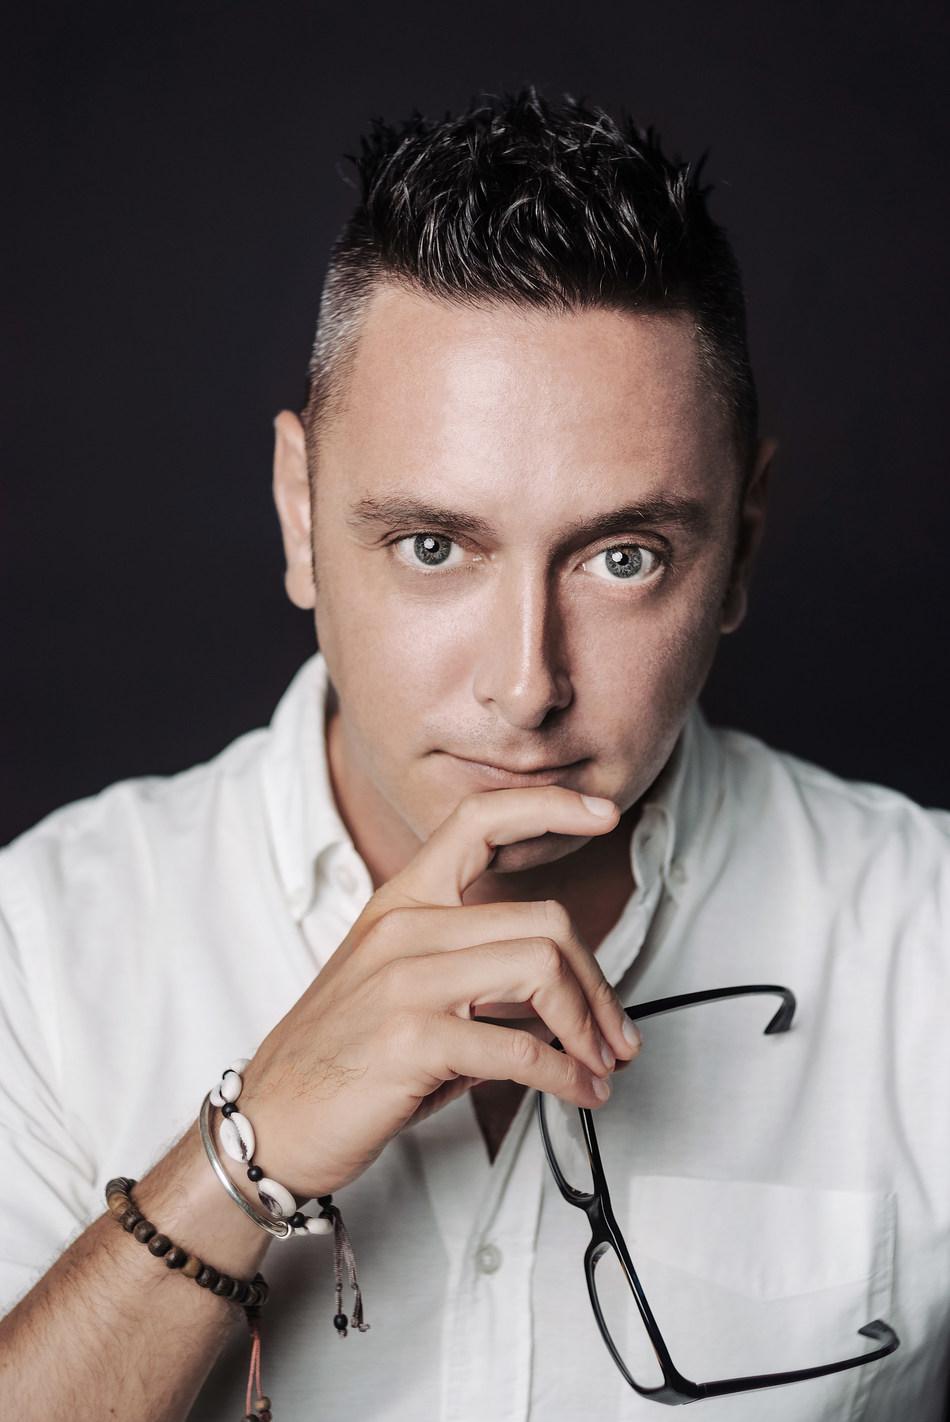 Eric Reithler-Barros